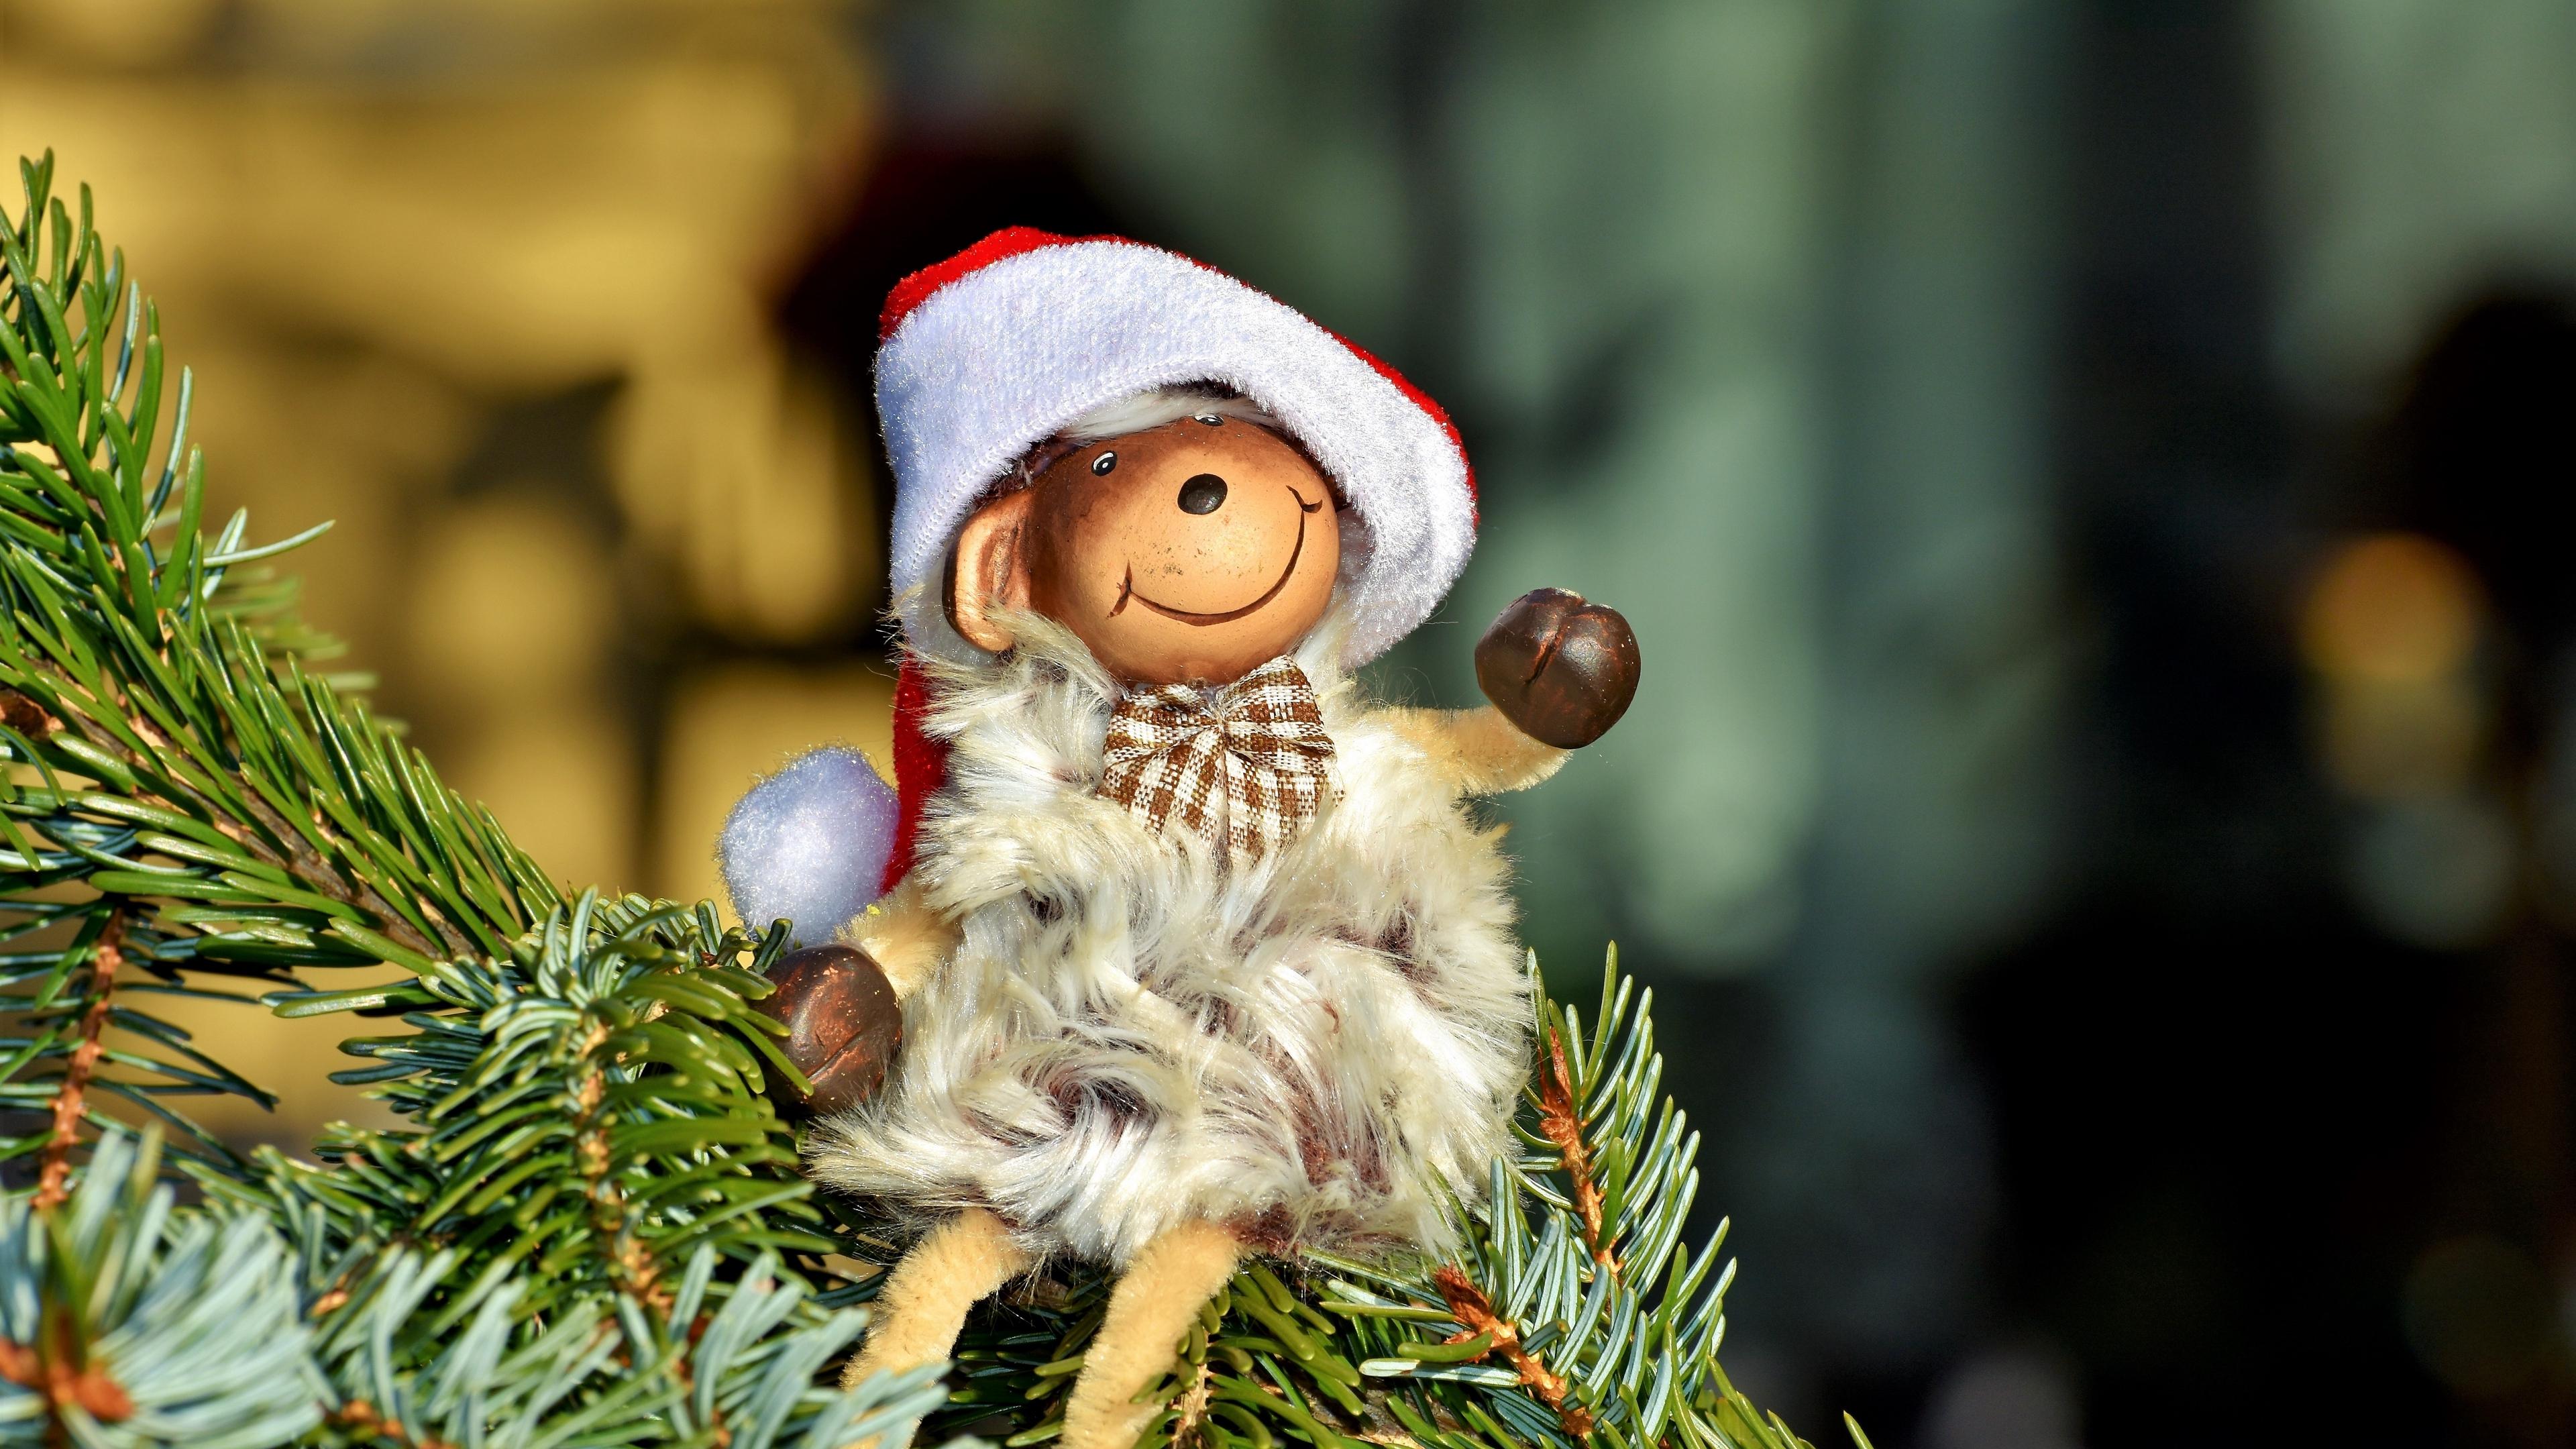 monkey new year fir toy 4k 1538344782 - monkey, new year, fir, toy 4k - new year, Monkey, fir